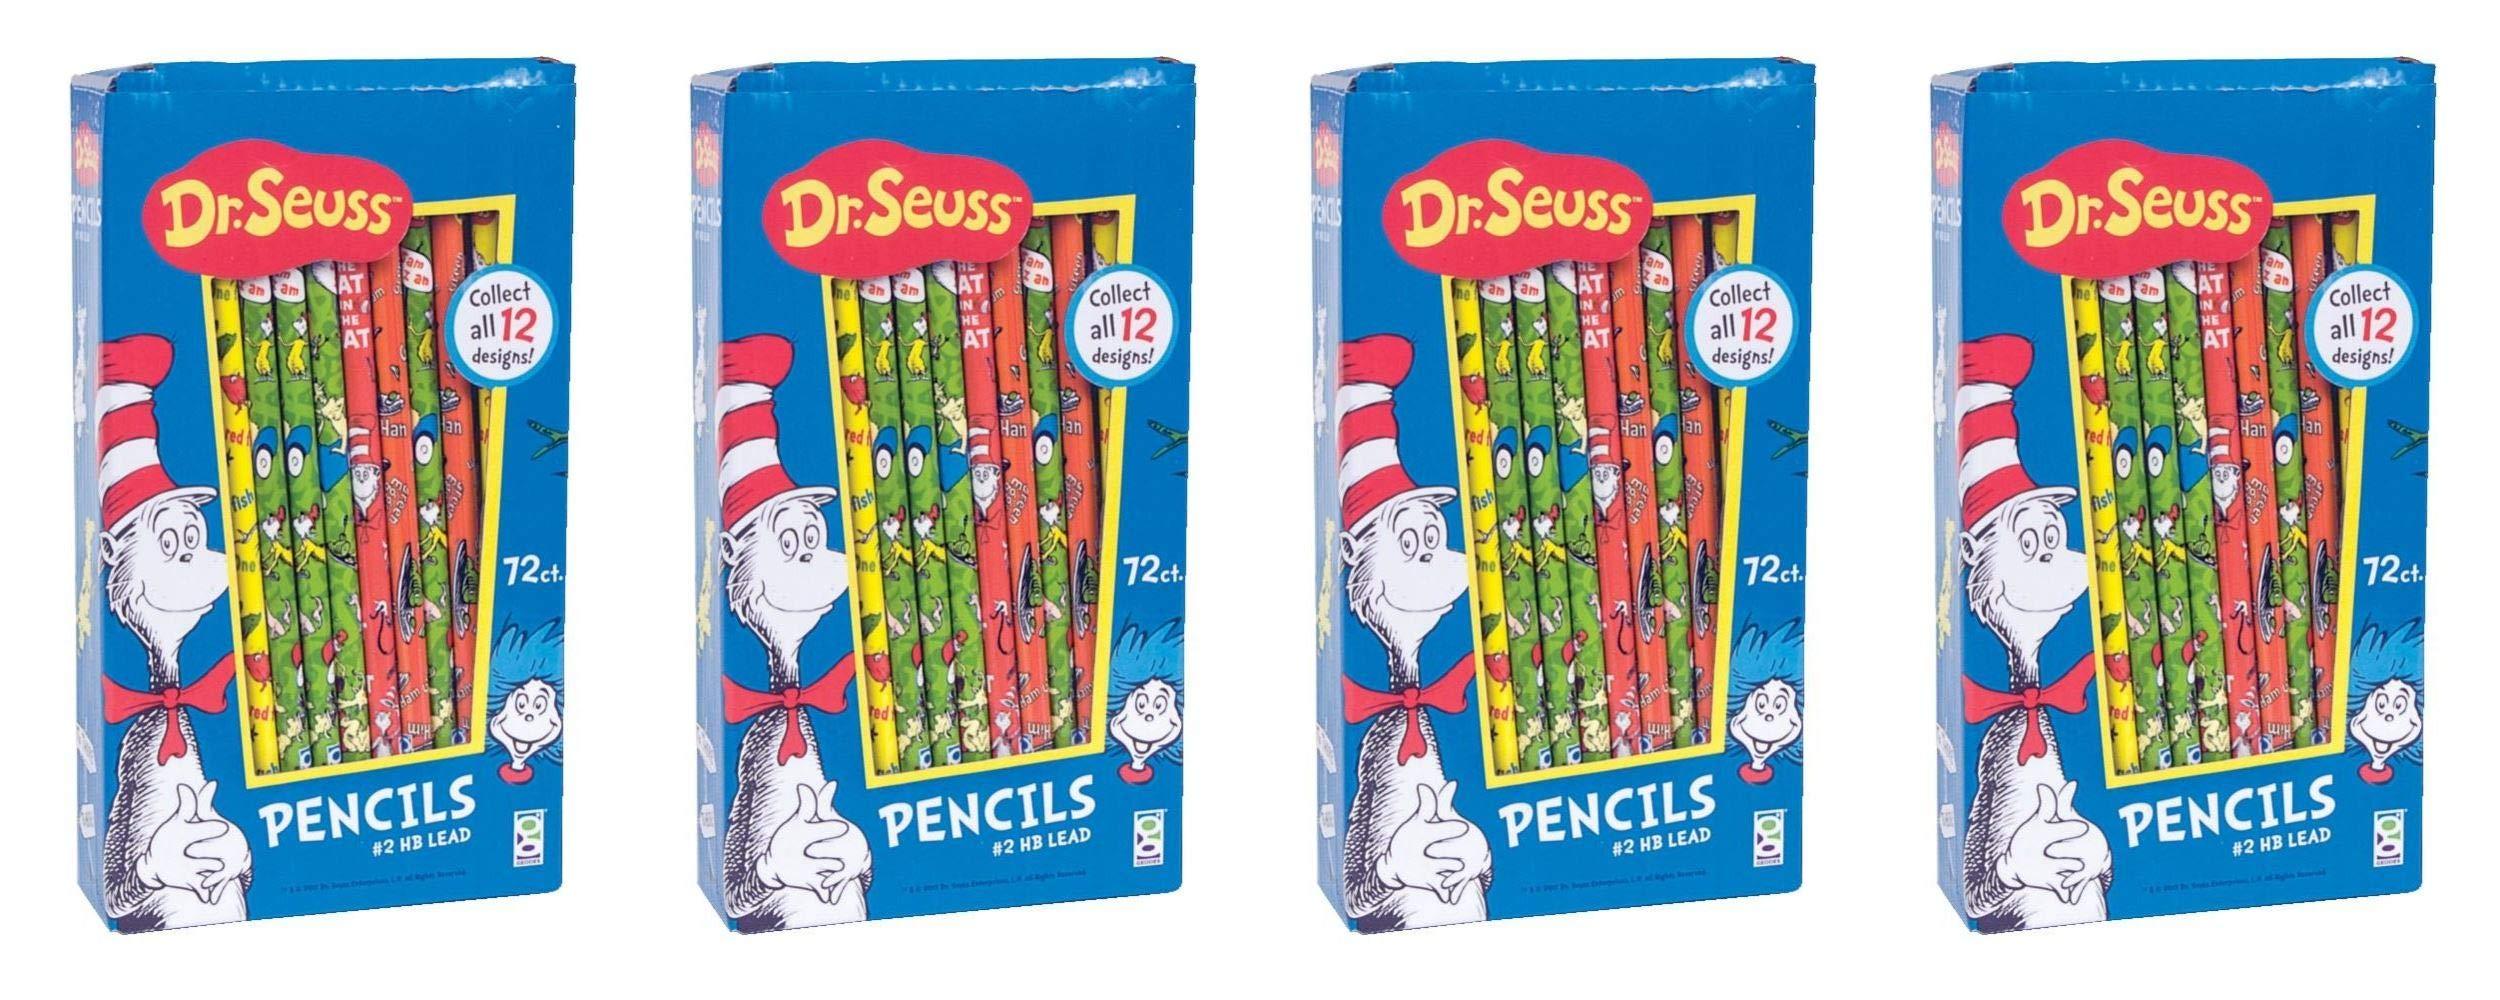 Raymond Geddes Dr. Seuss Pencil Too, 72 Pack (68508) (Fоur Paсk) by Raymond Geddes (Image #1)